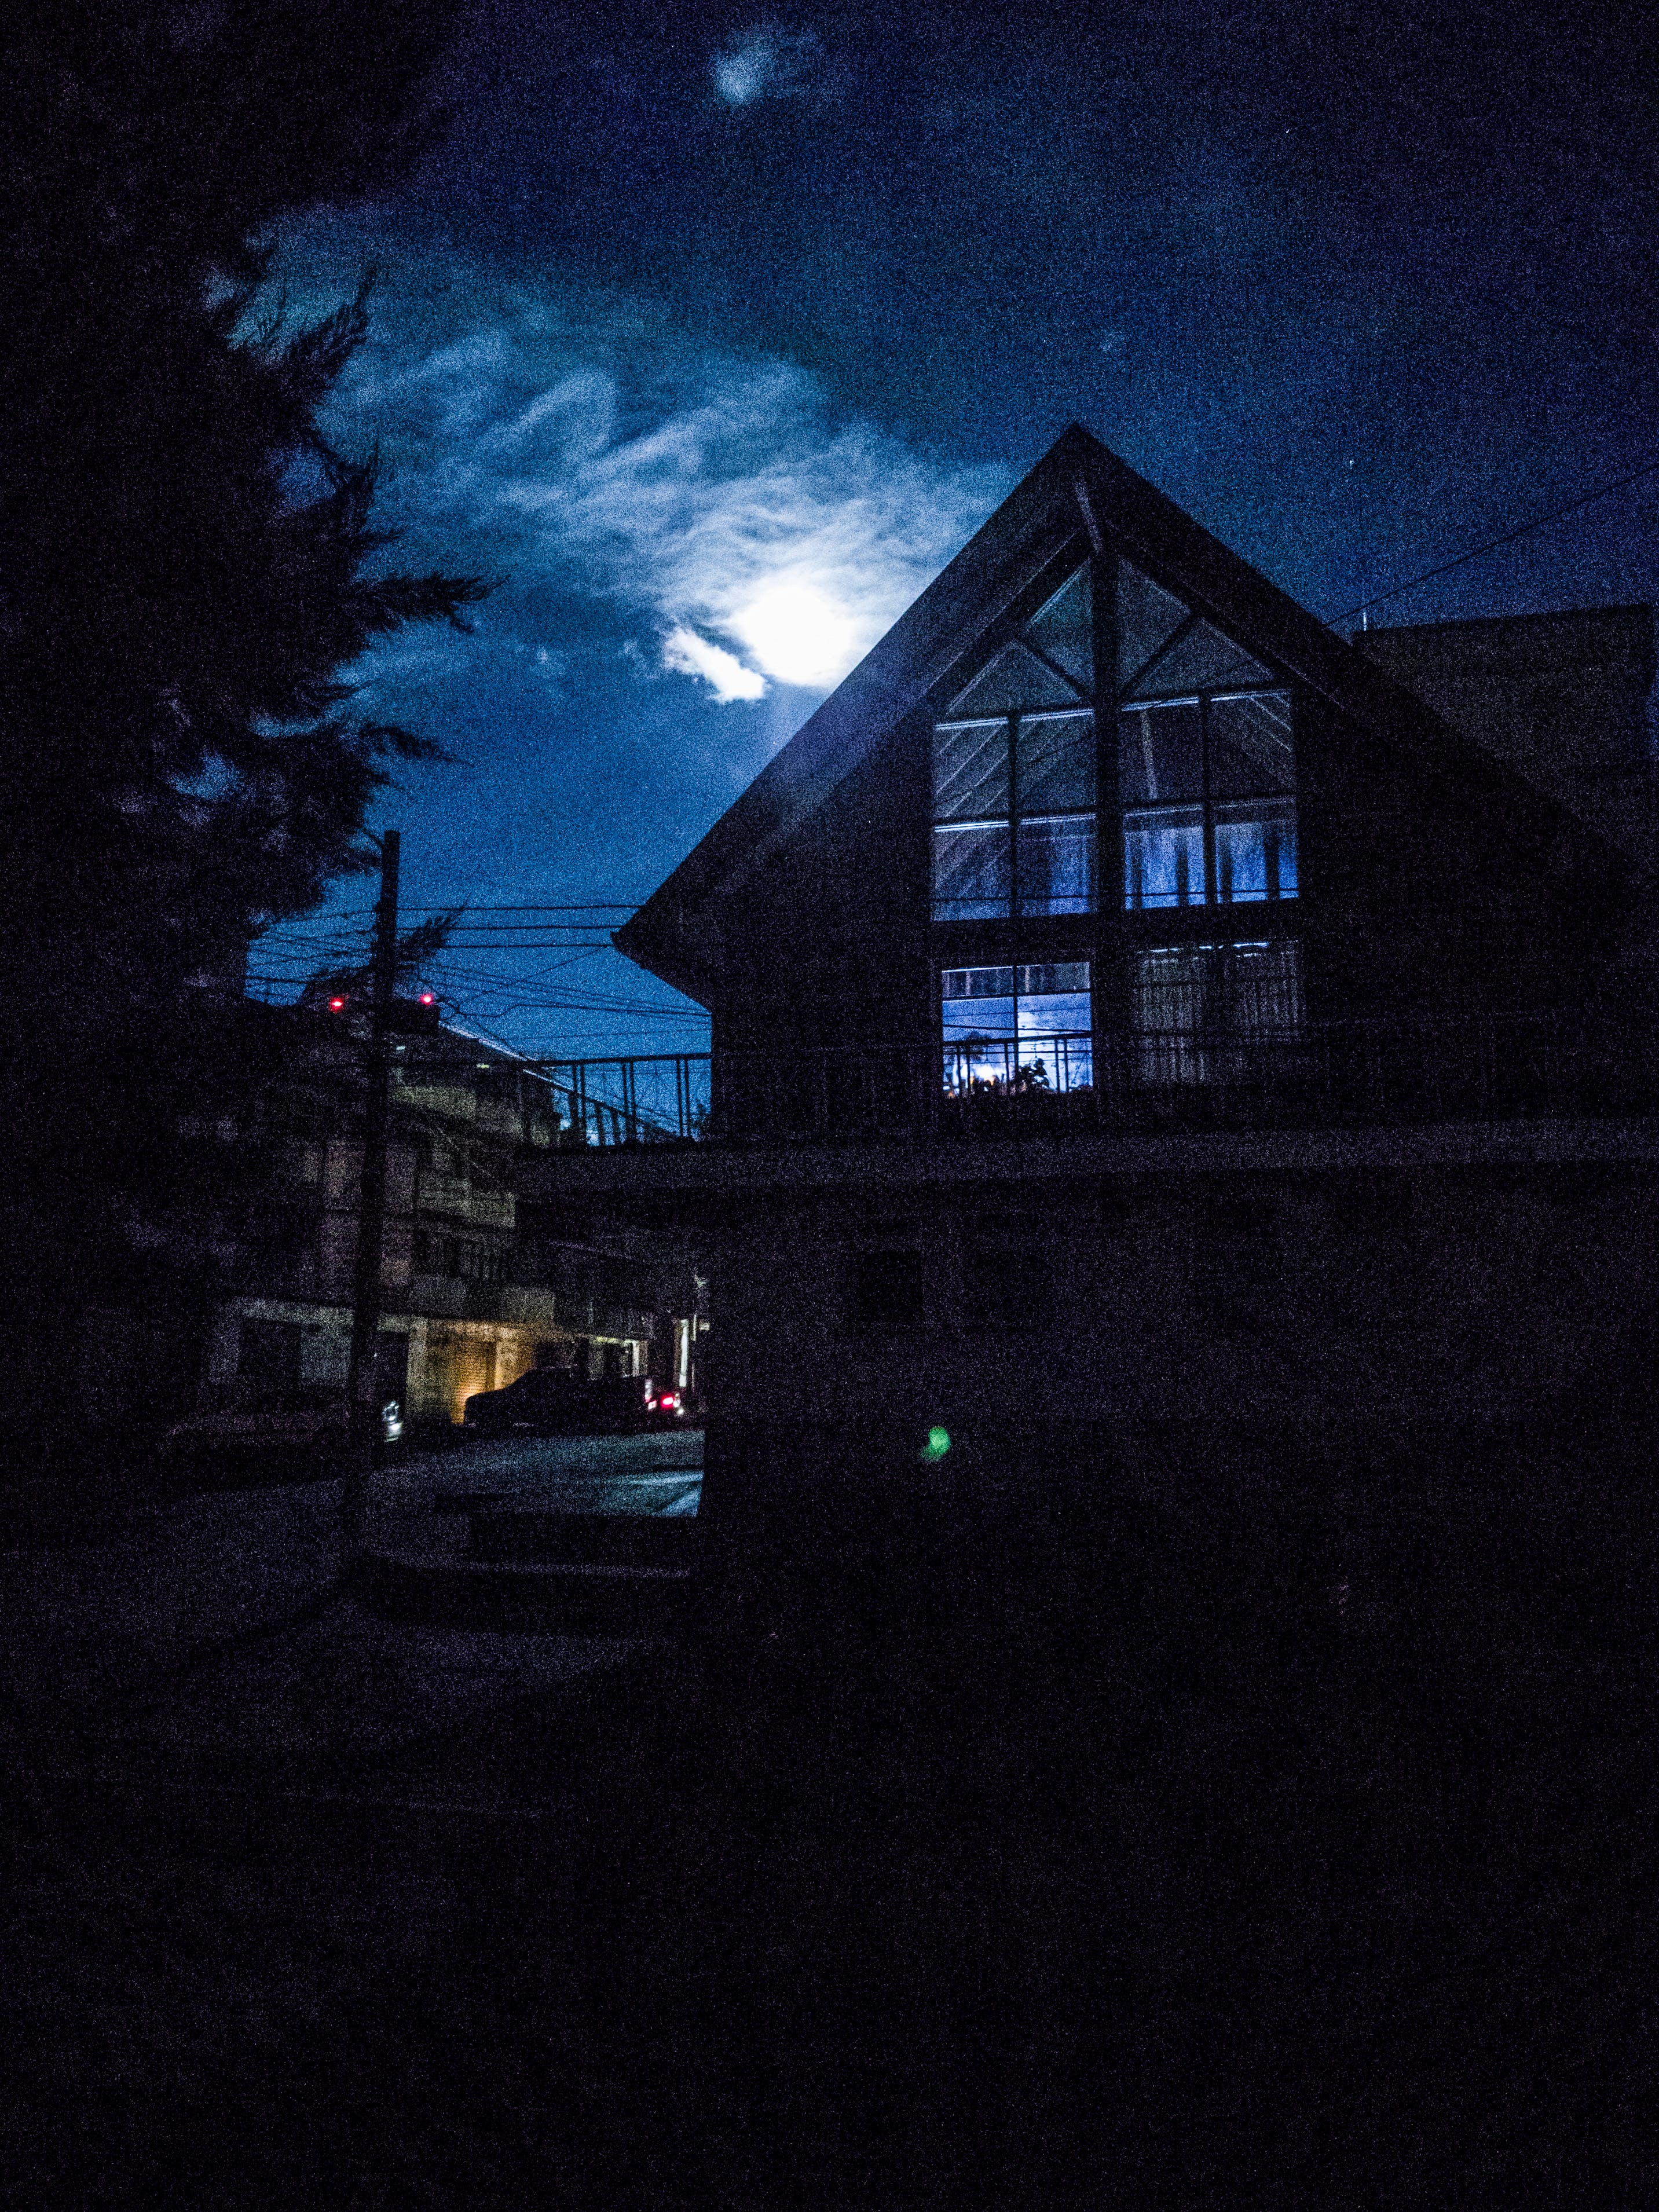 luna, night